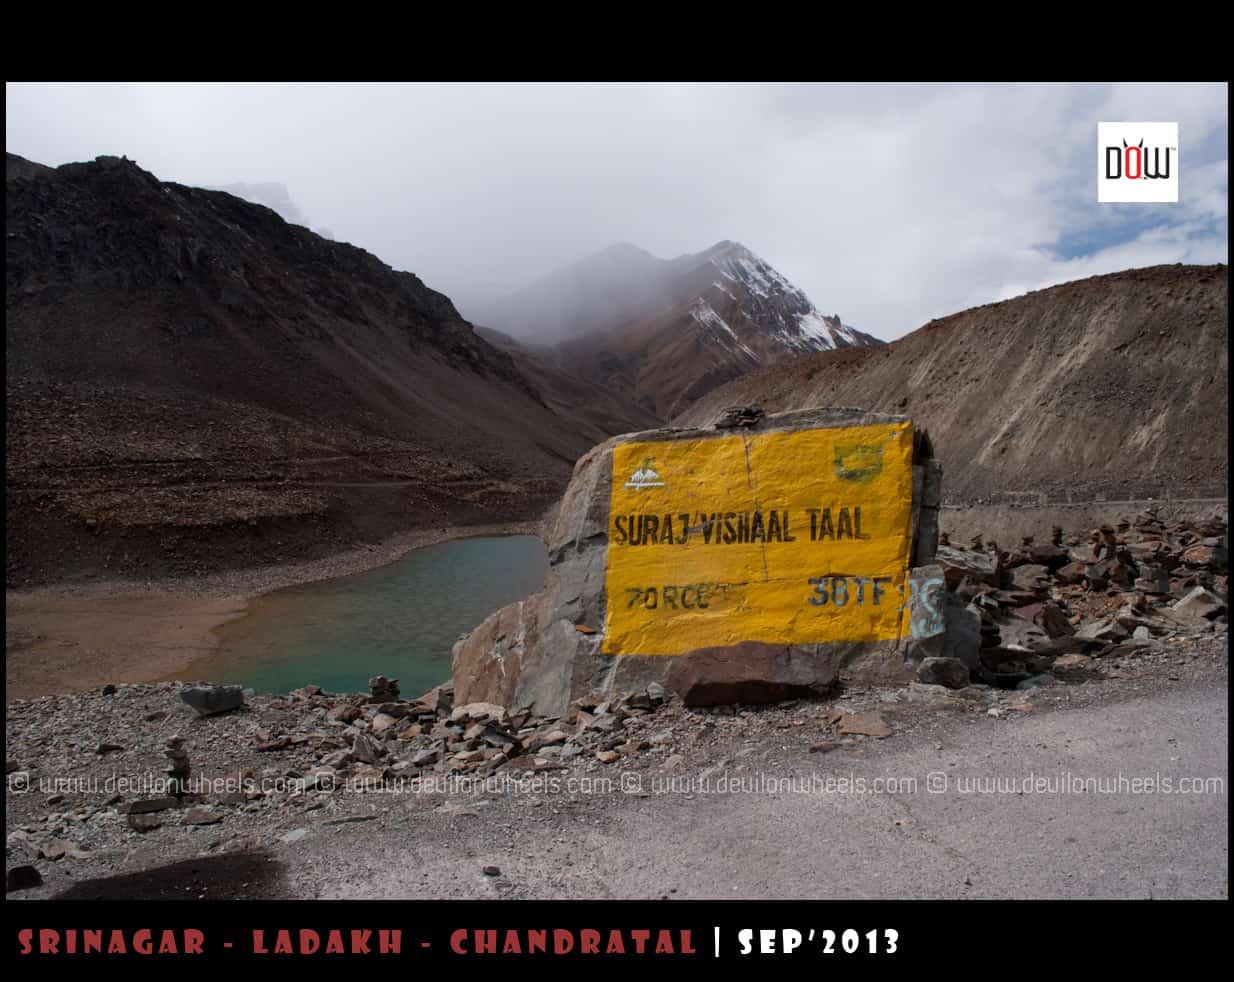 Suraj Tal / Vishal Tal Lake